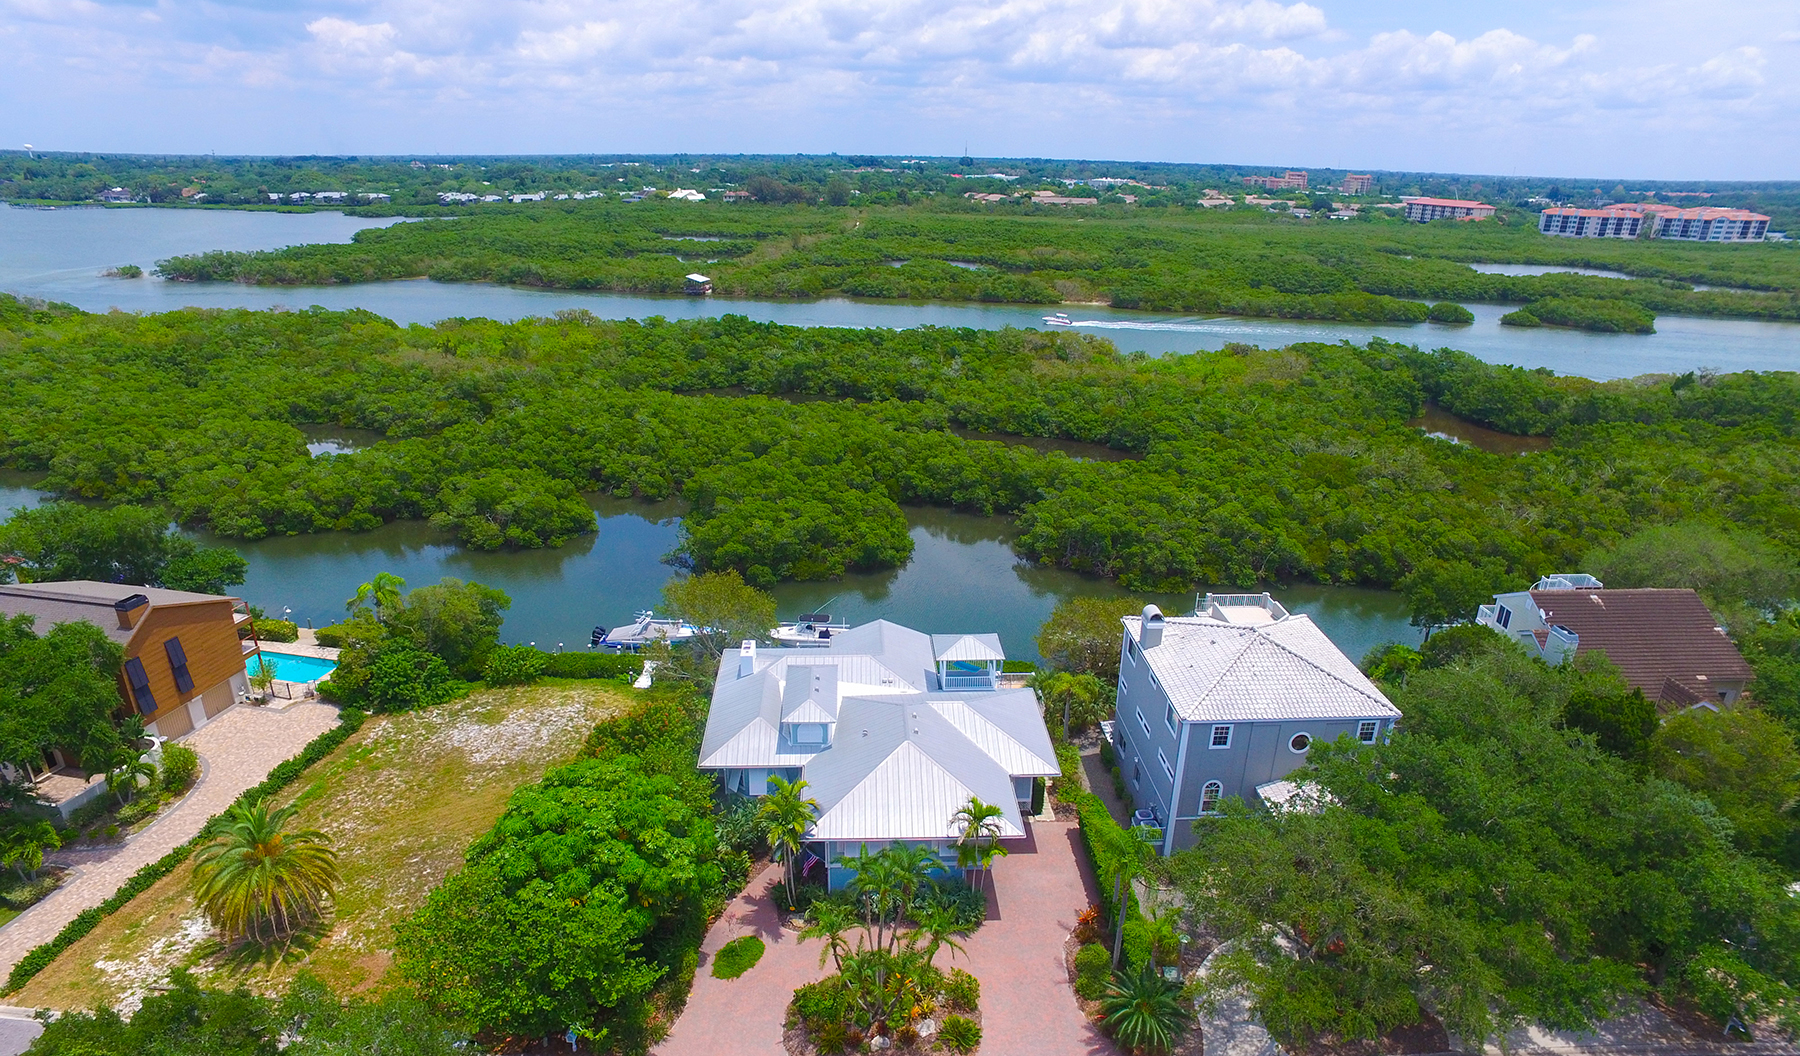 Casa Unifamiliar por un Venta en SIESTA COVE 5244 Siesta Cove Dr Sarasota, Florida, 34242 Estados Unidos